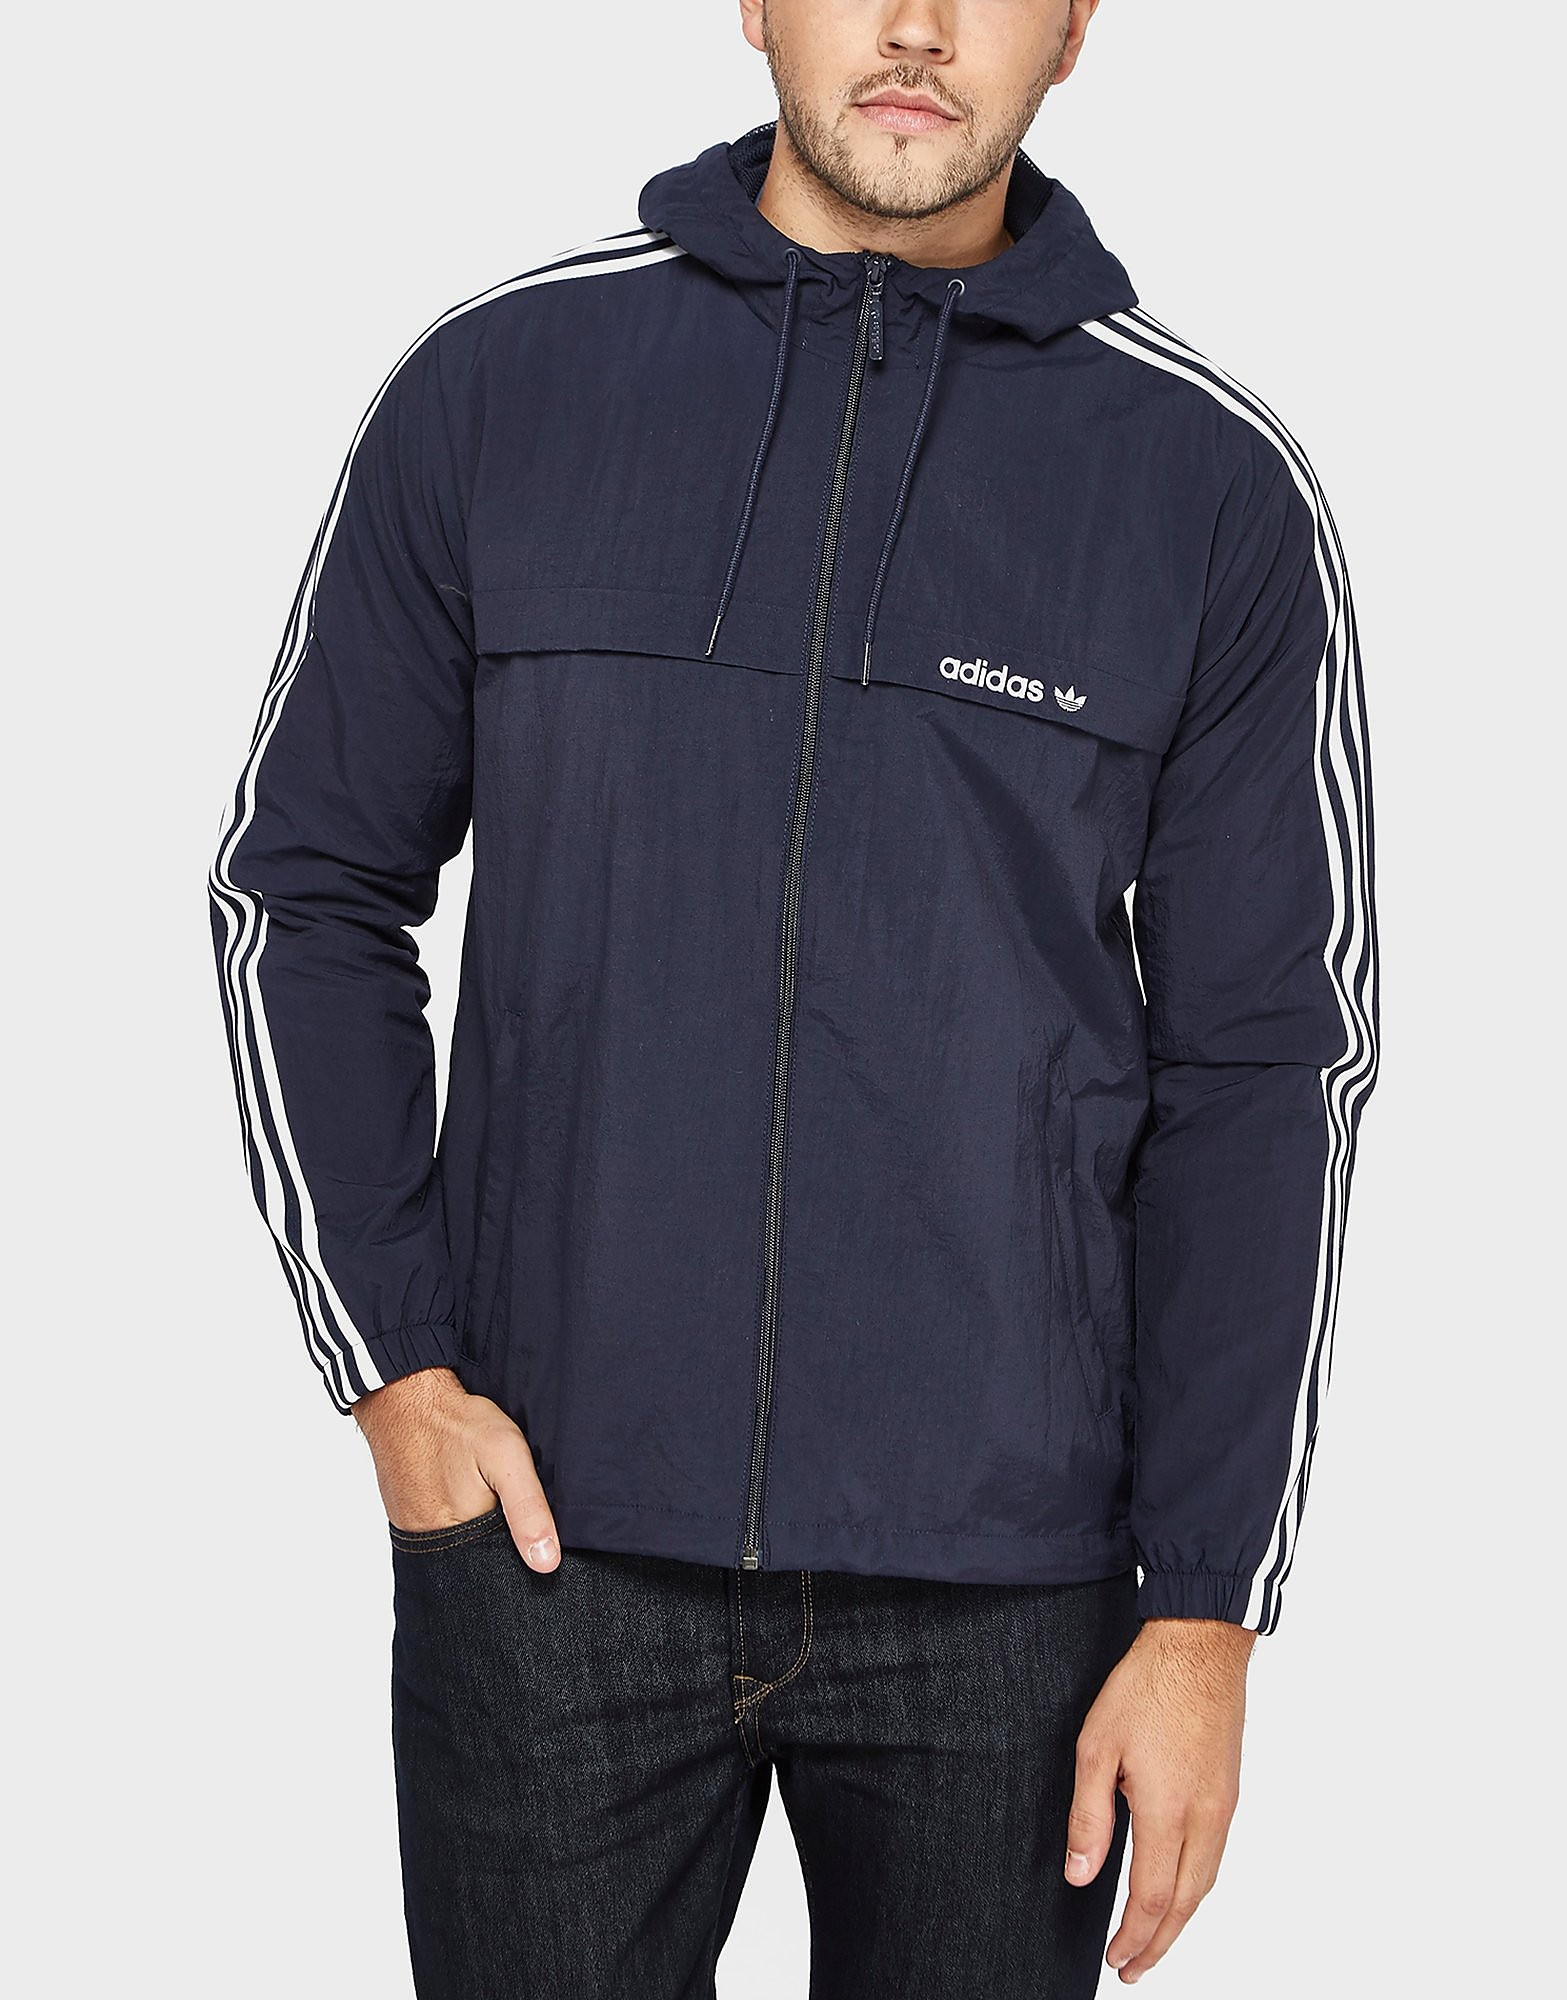 adidas Originals 3 Stripe Jacket